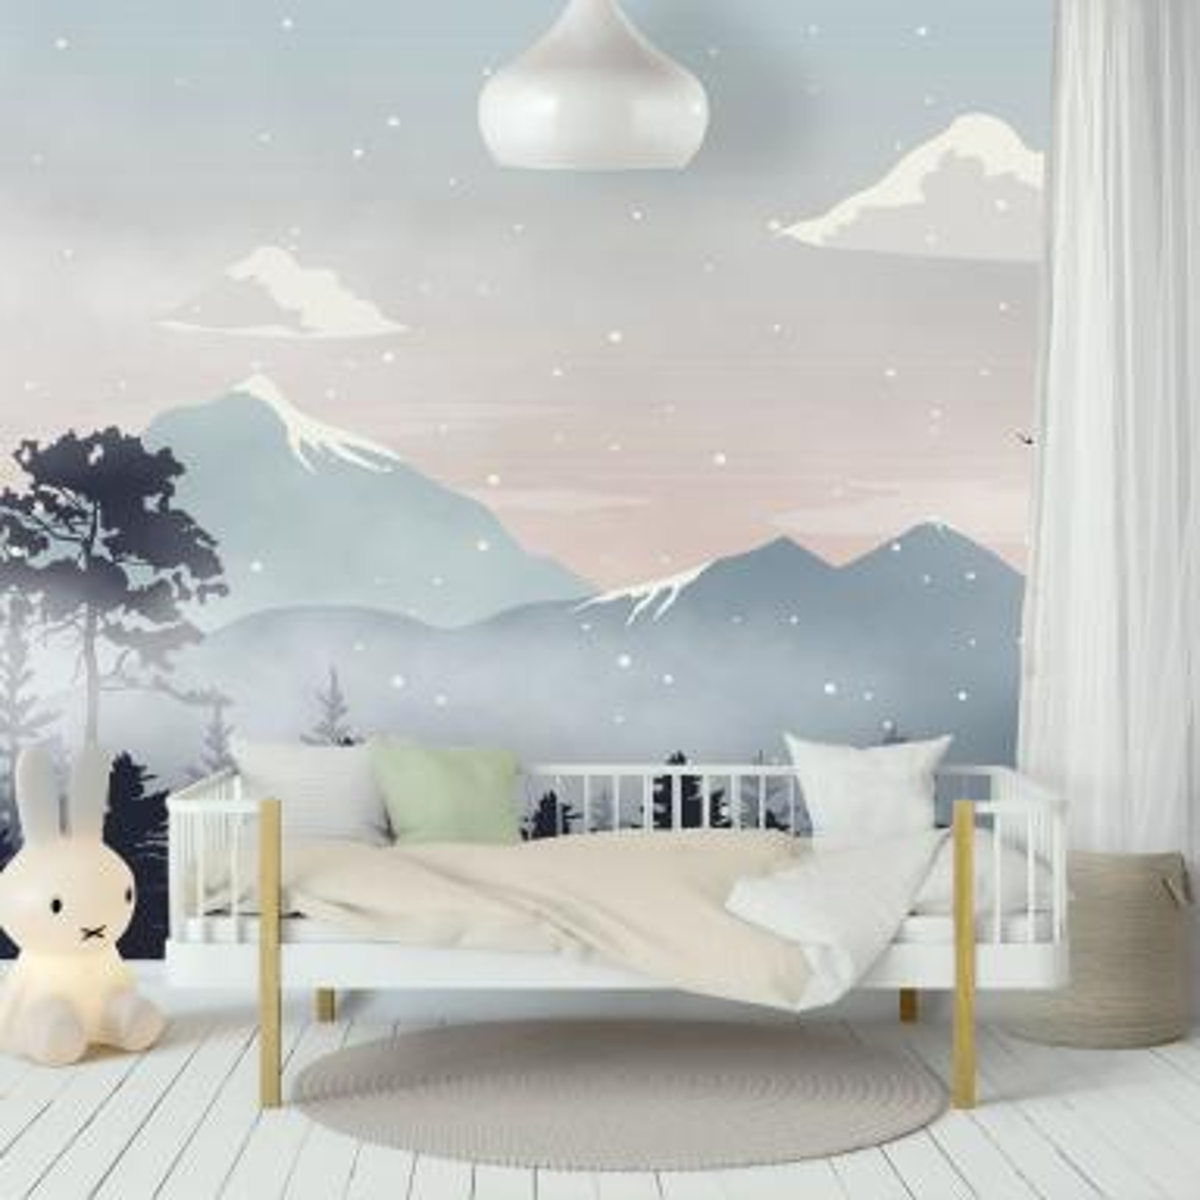 kids mountain landscape with snow wallpaper mural wm 260000td 31479906